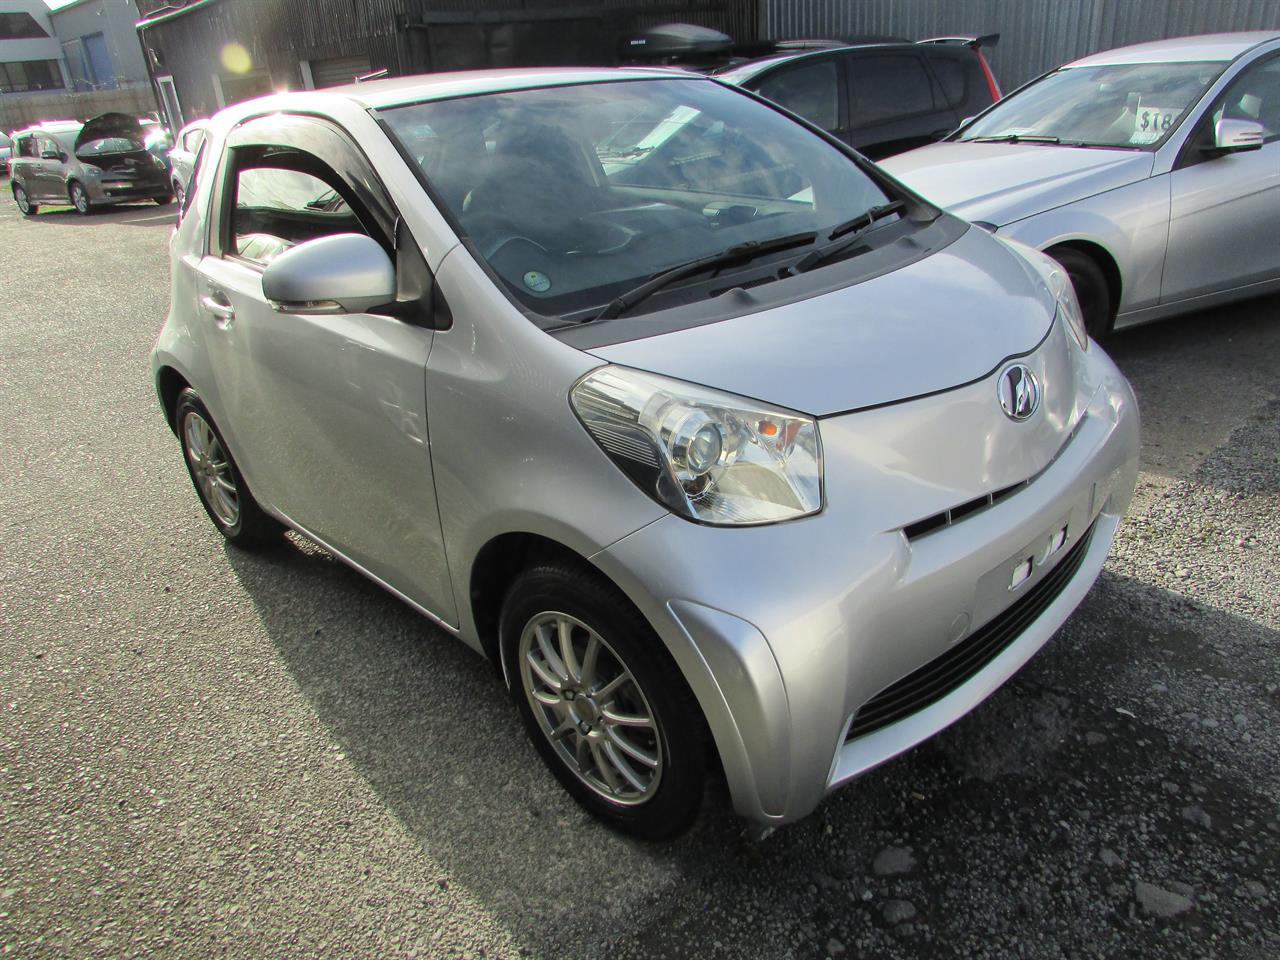 Motors Cars & parts Cars : 2008 Toyota IQ 4 Seats Smart Looking ECO DRIVING MODE NICE CAR